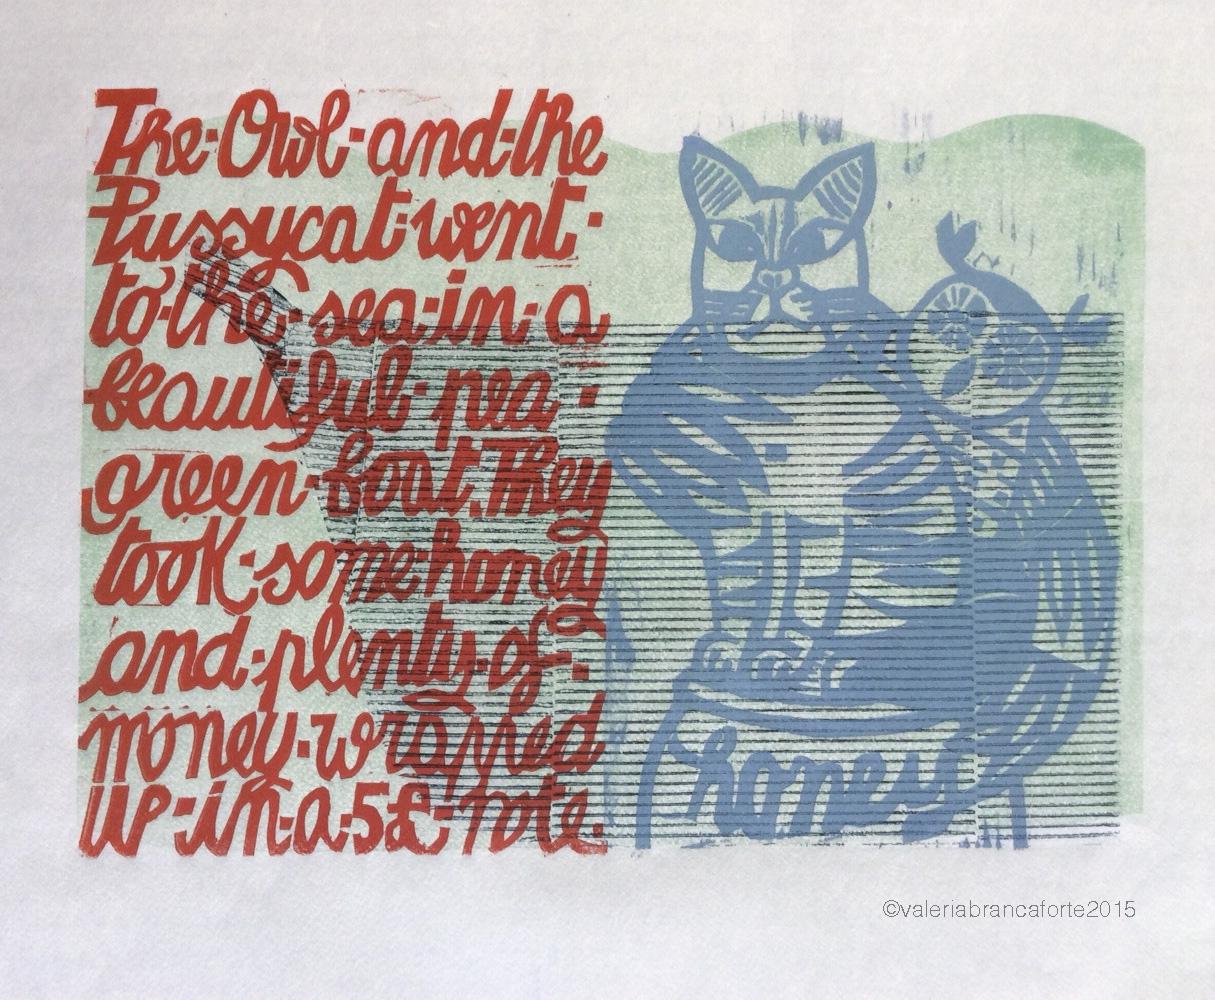 The Owl and the Pussycat , Edward Lear. 4-color print, additive plates. Valeria Brancaforte, 2015